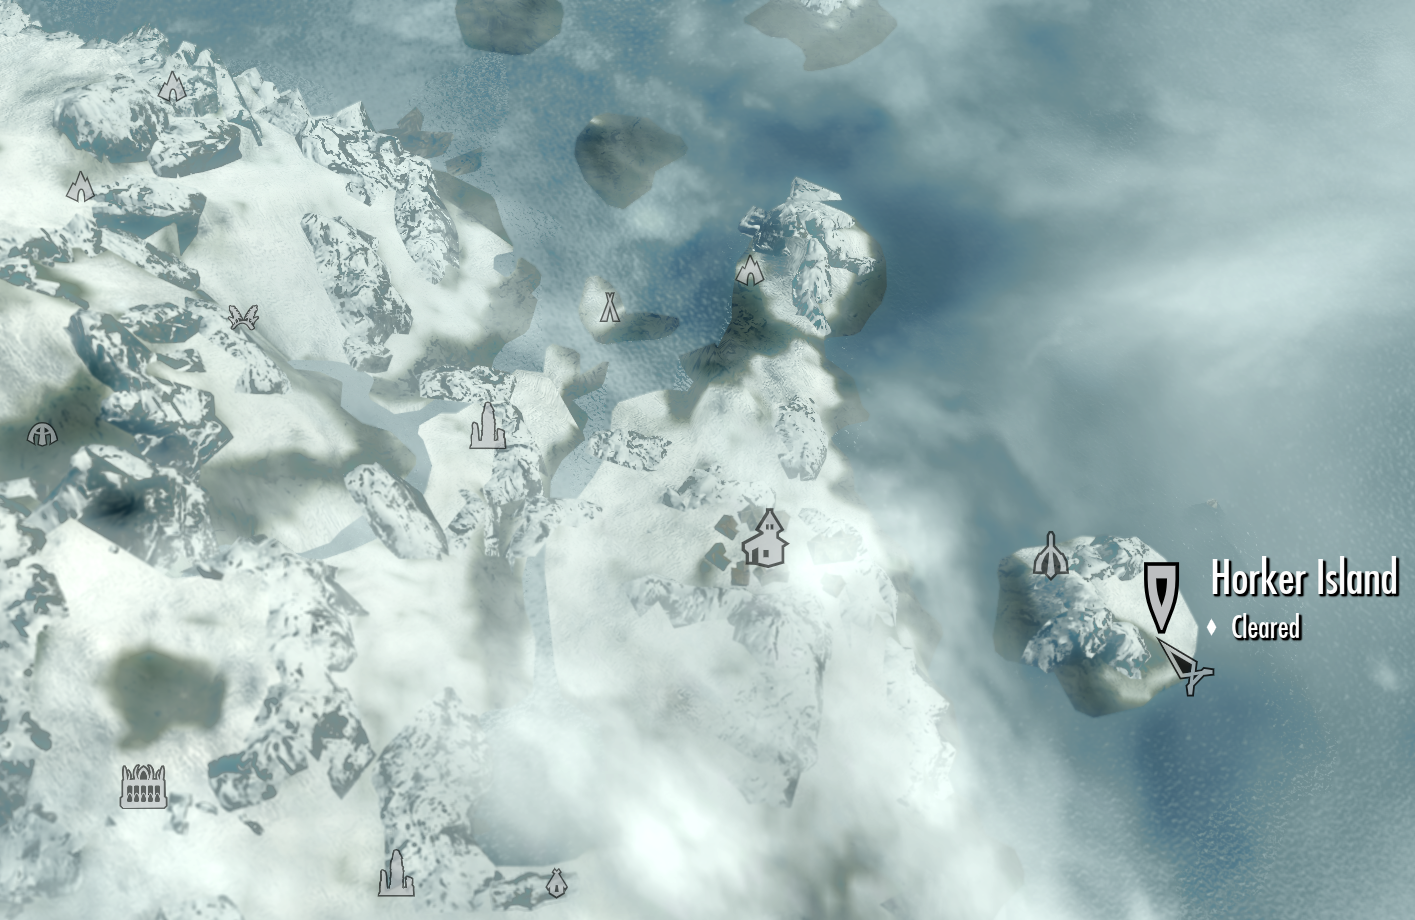 http://img2.wikia.nocookie.net/__cb20130211022301/elderscrolls/images/c/c9/Horker_Island_Map.png